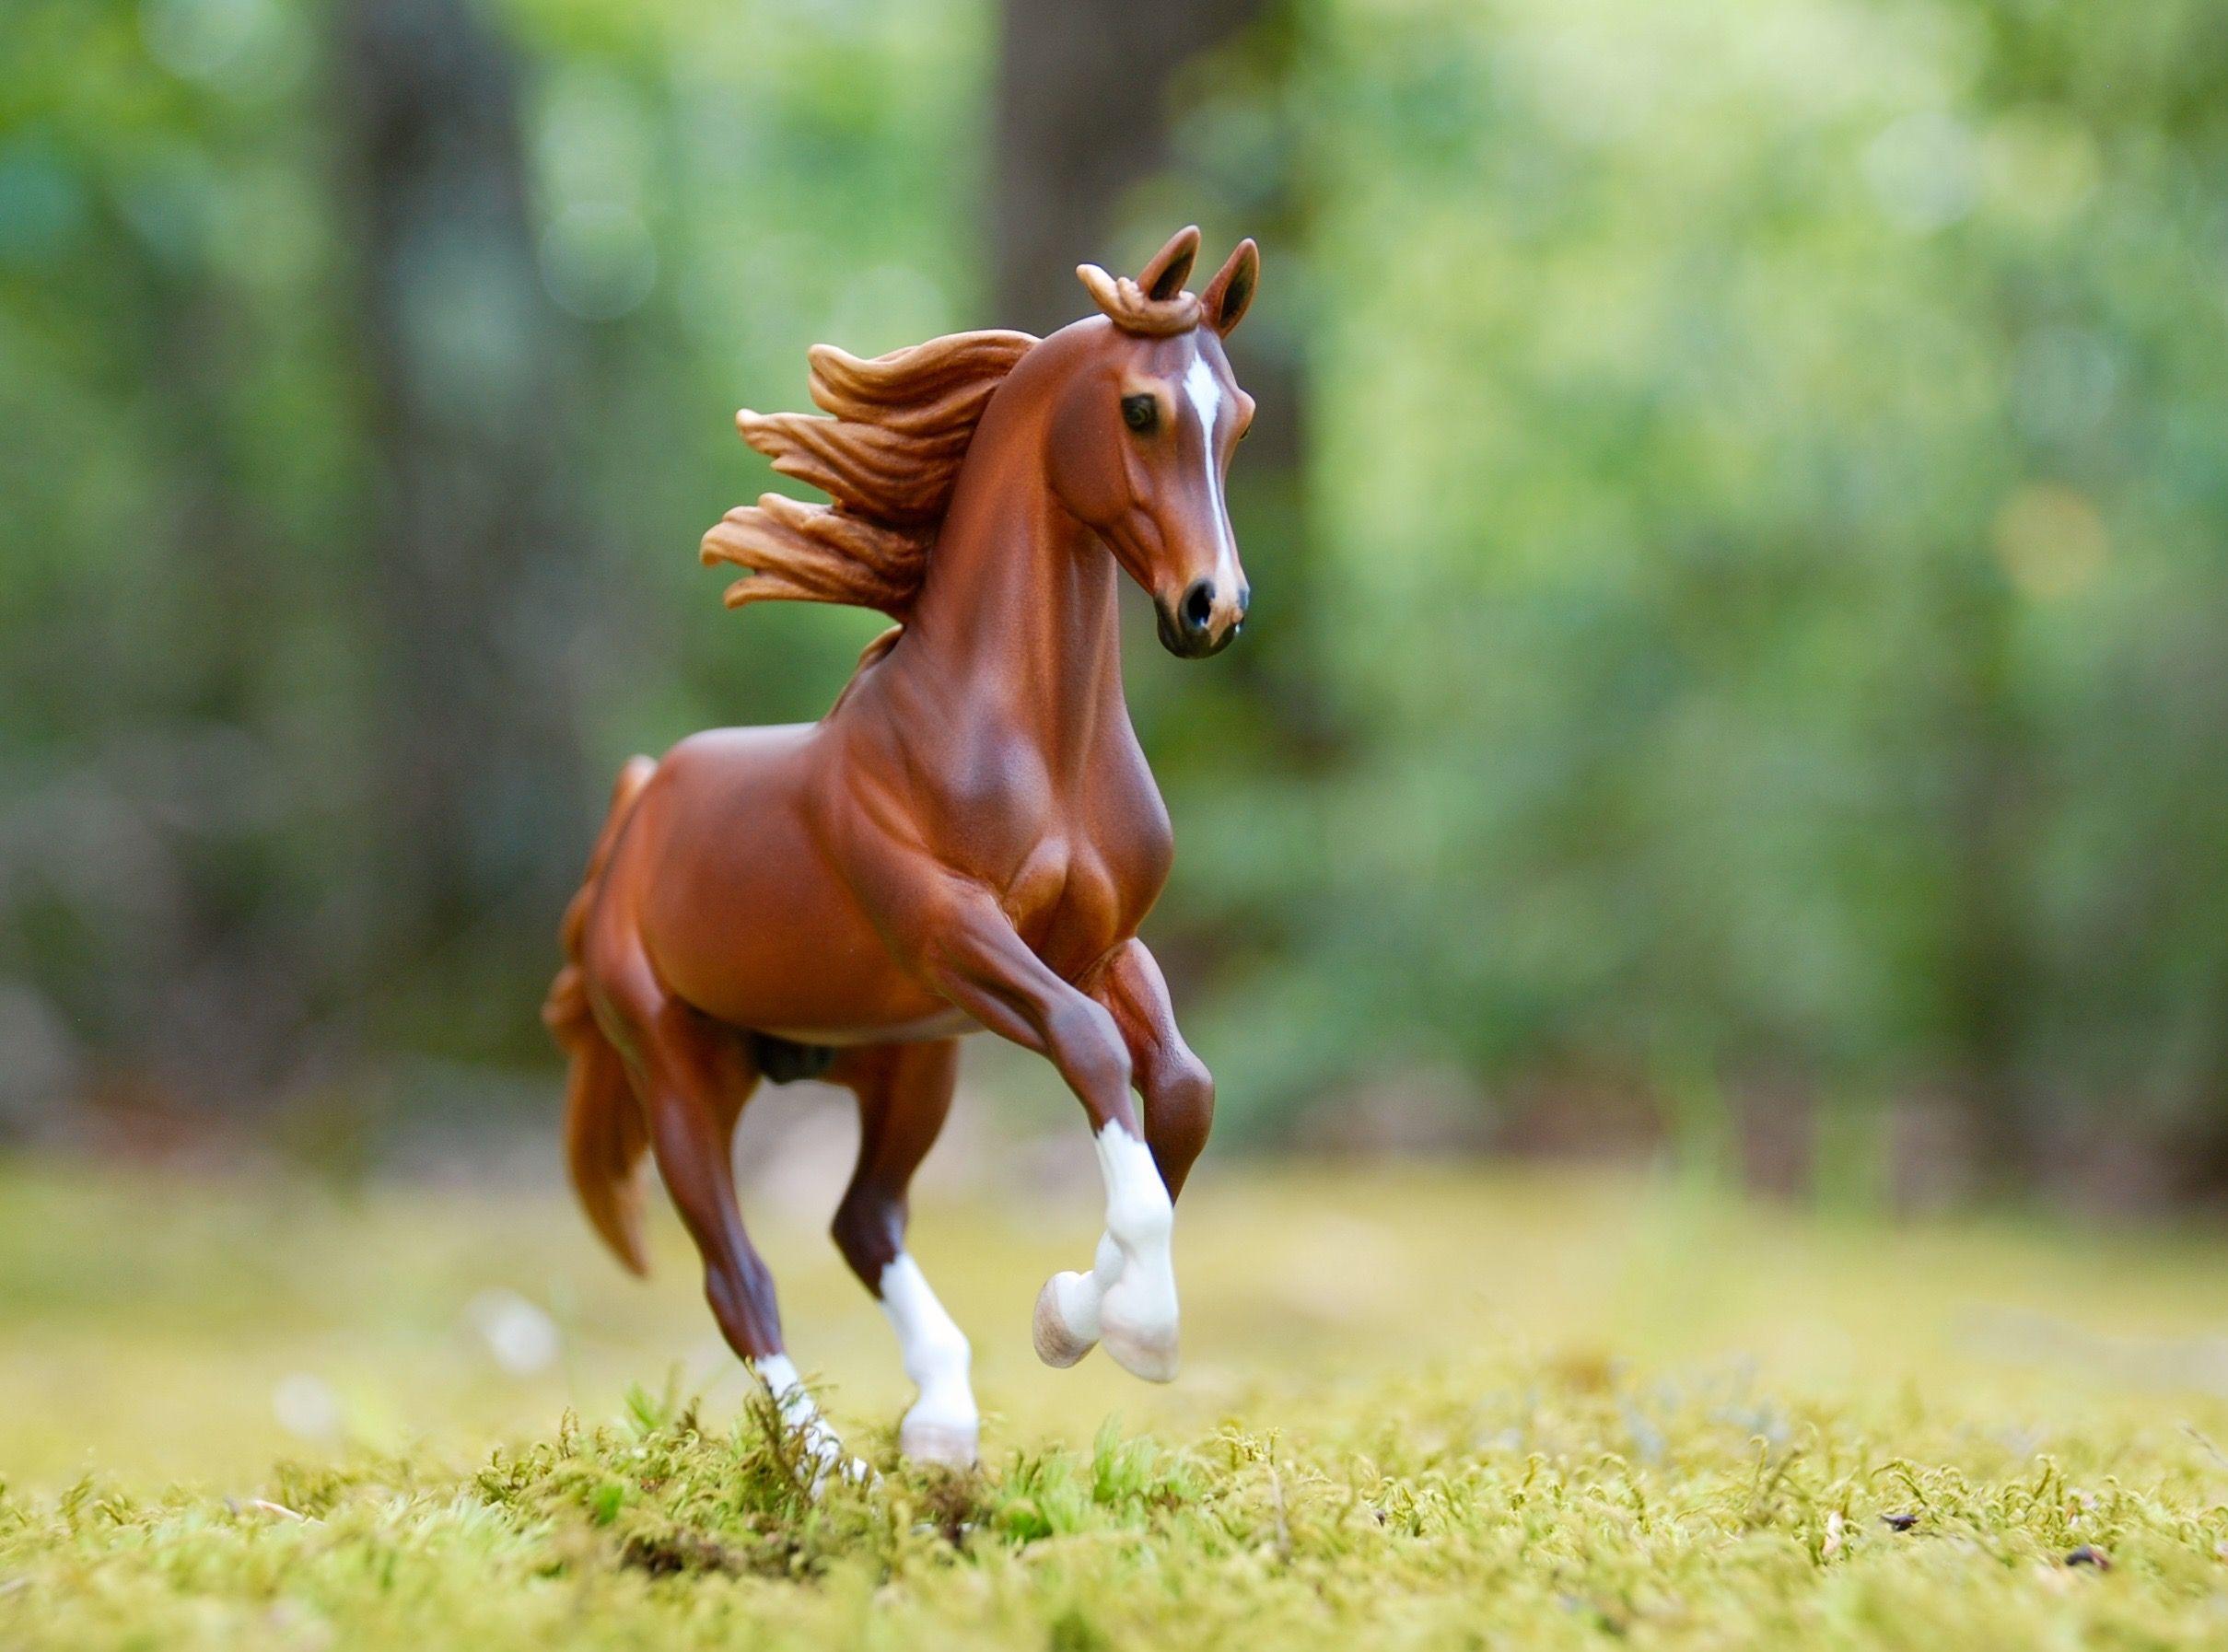 картинки лошадей брейер на природе фото камеры, правда